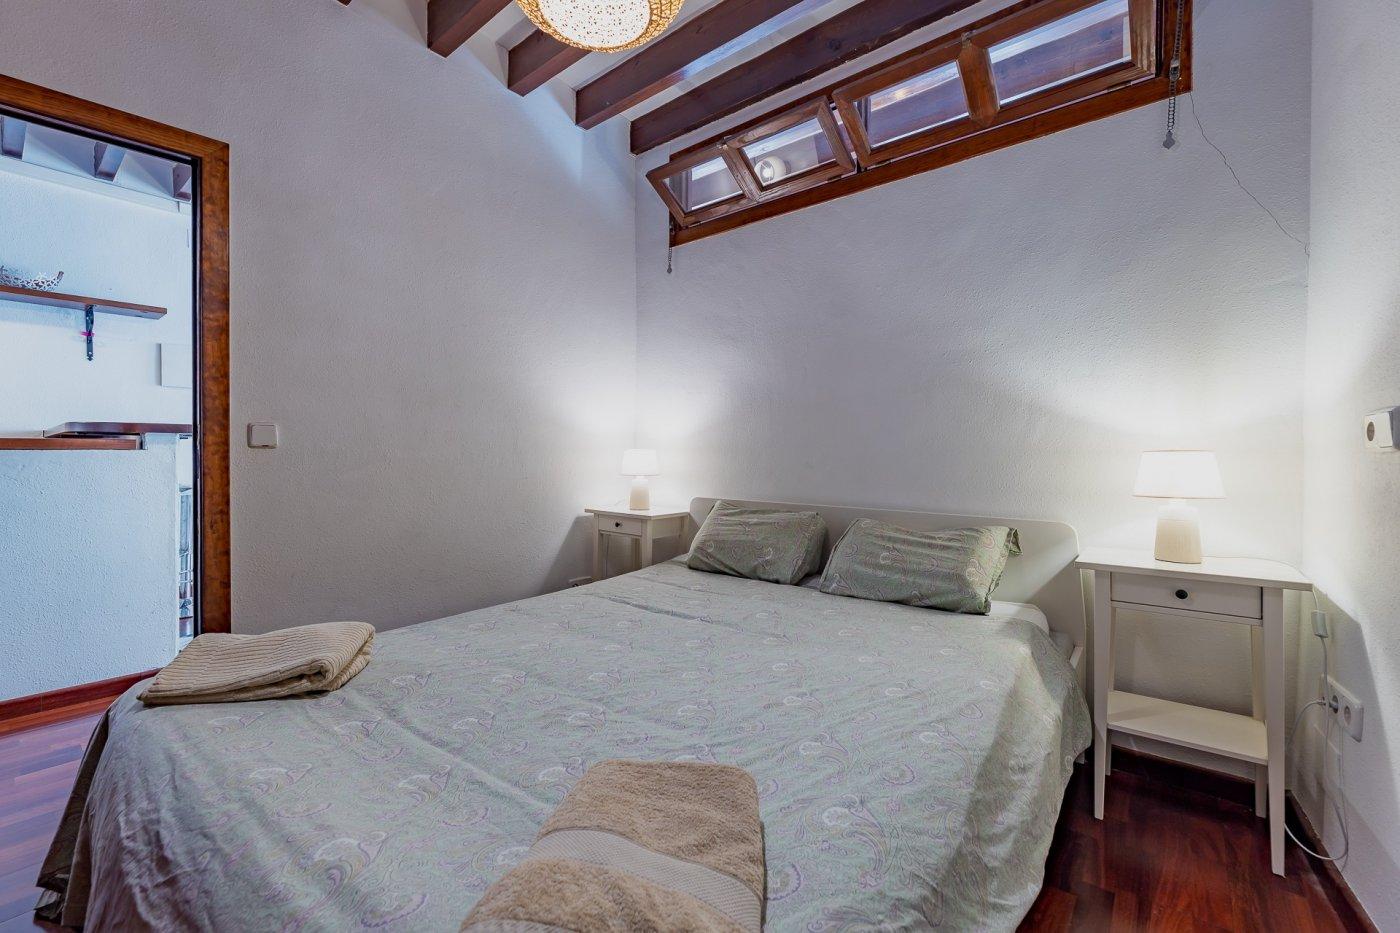 Espectacular apartamento en centro de palma - imagenInmueble9